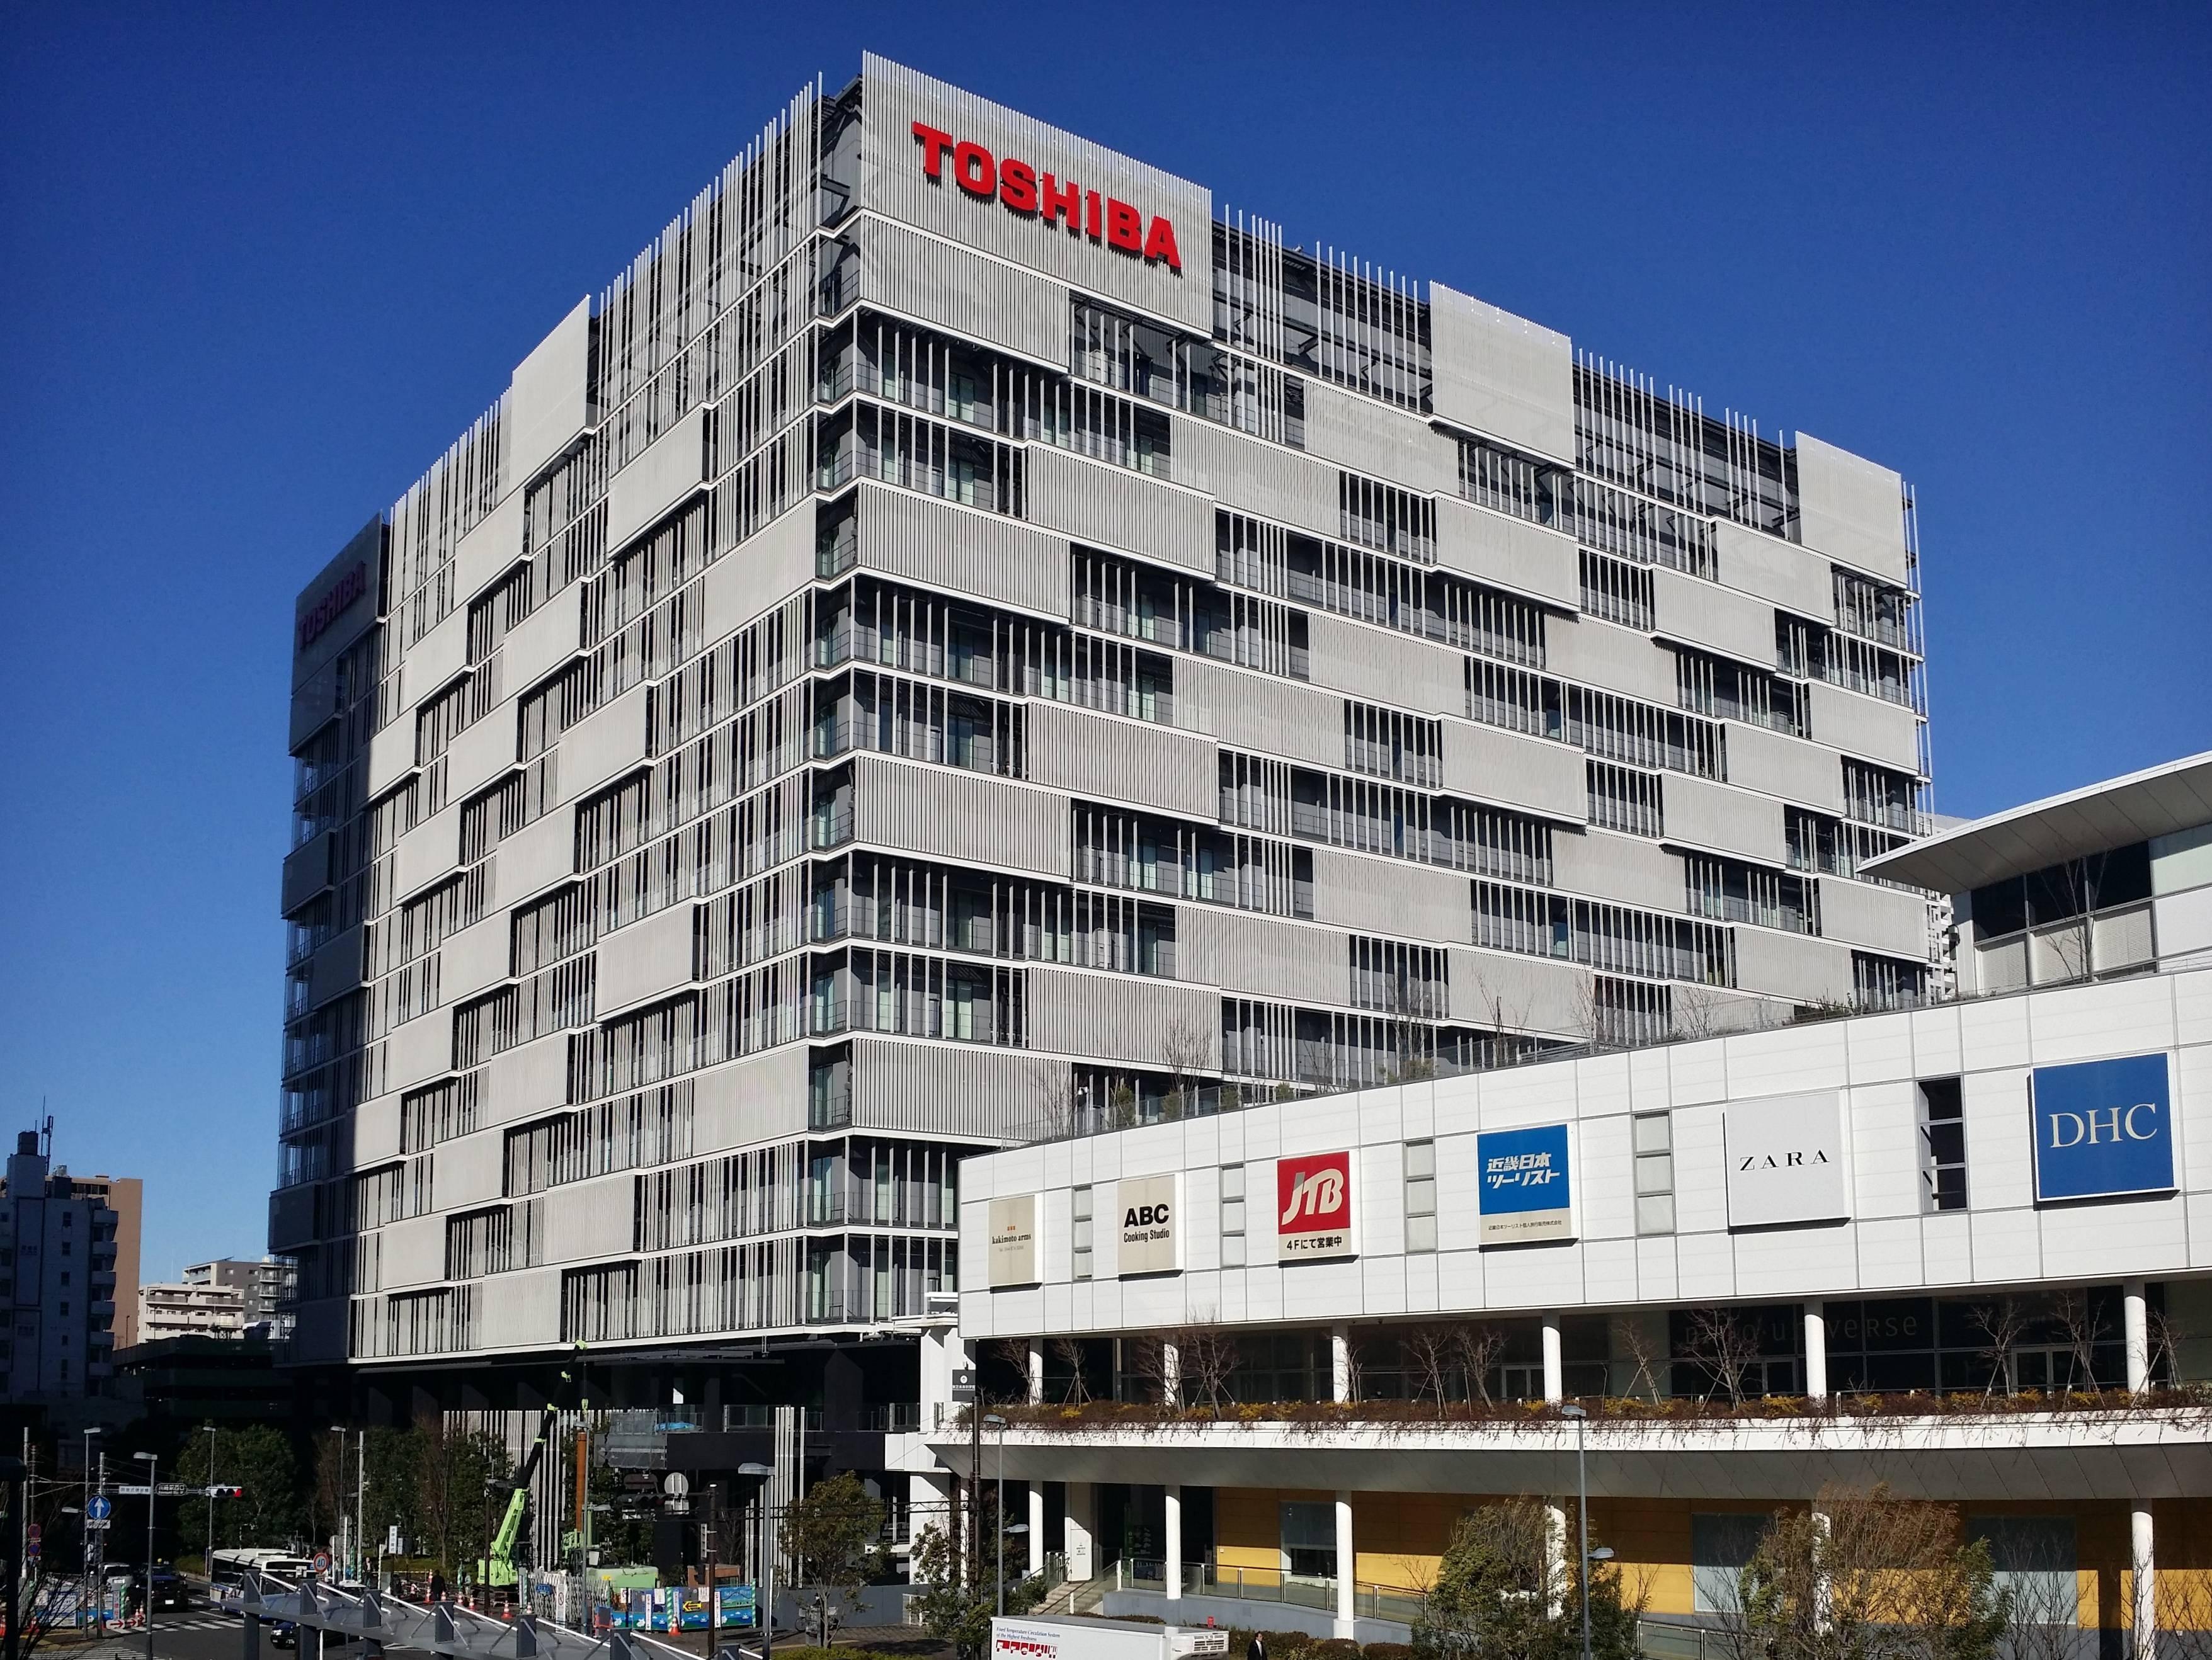 lazona kawasaki toshiba building.jpg?resize=1200,630 - 東芝大分工場の社員の命運を分けた「ソニー」「東芝」の2択問題